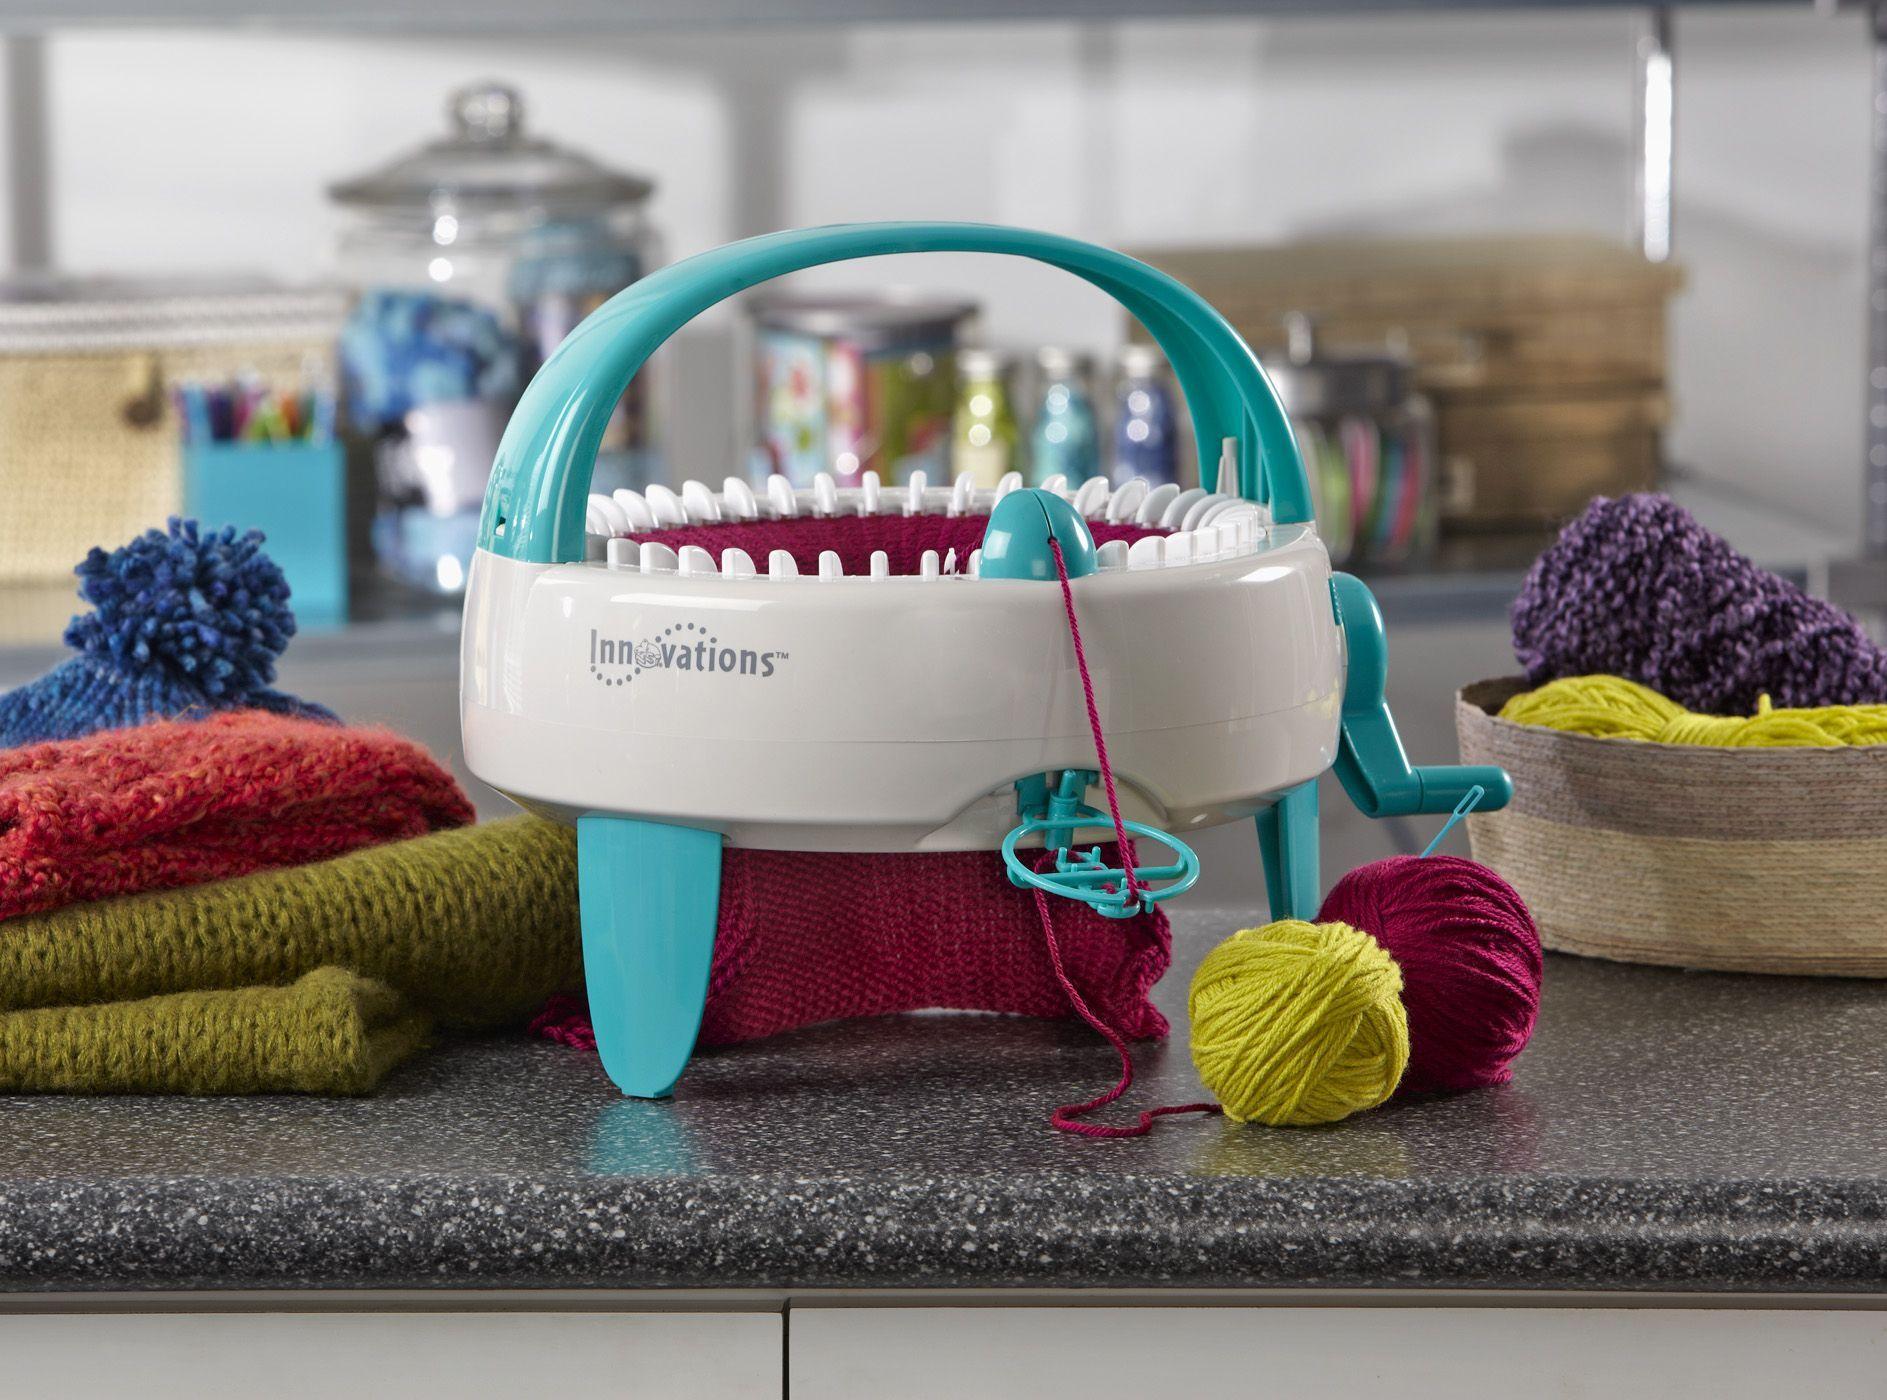 acaa440e2f1 Fingerhut - Innovations Knitting Machine